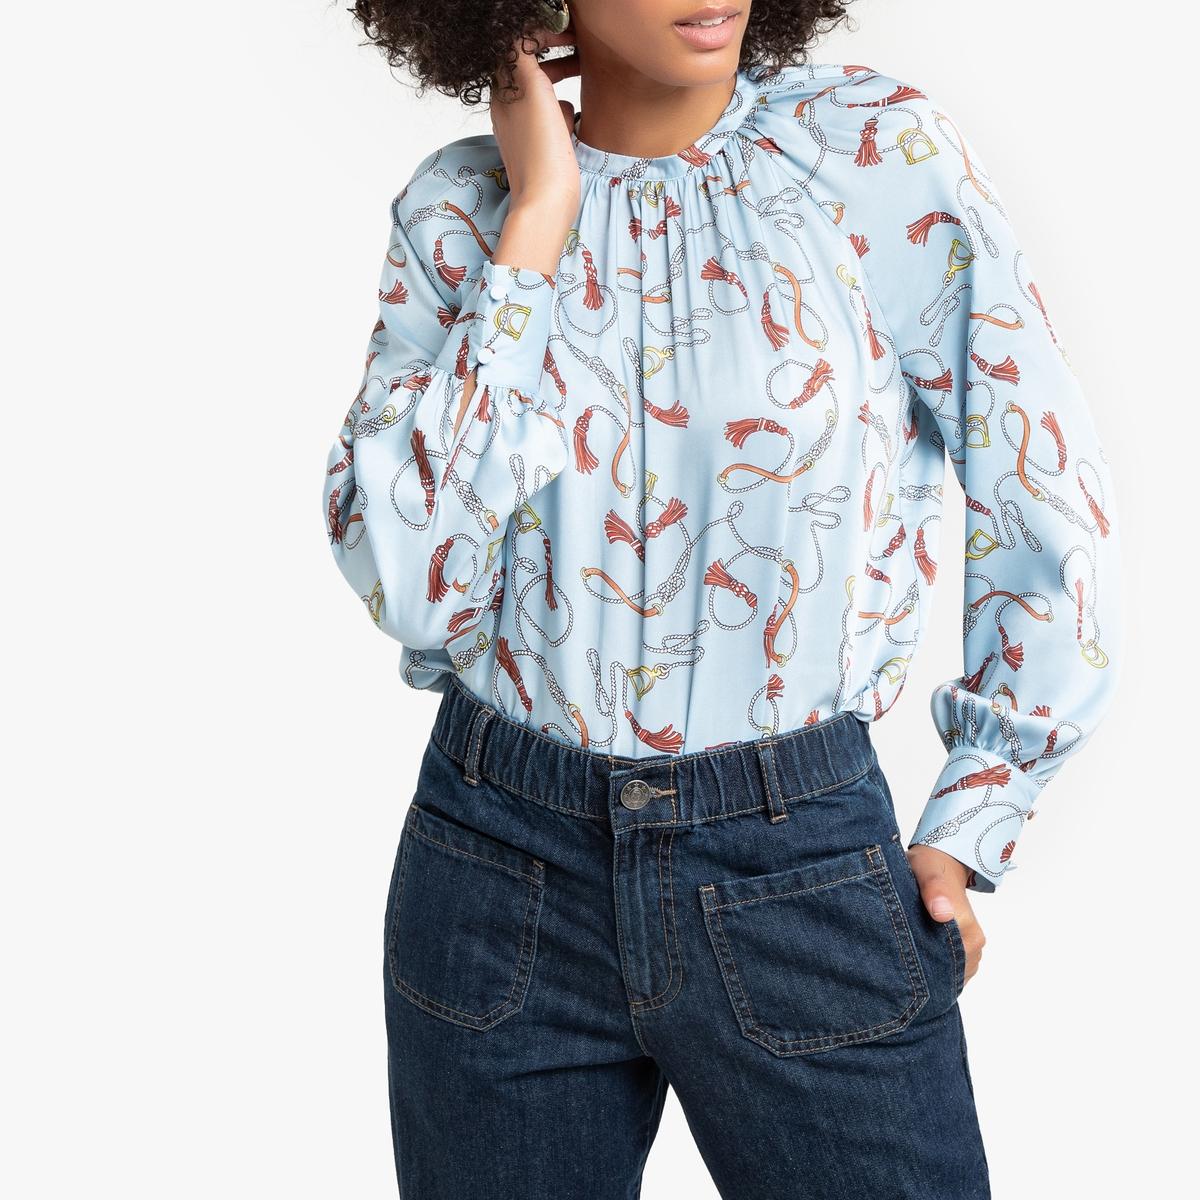 Blusa estampada con cuello redondo, de manga larga